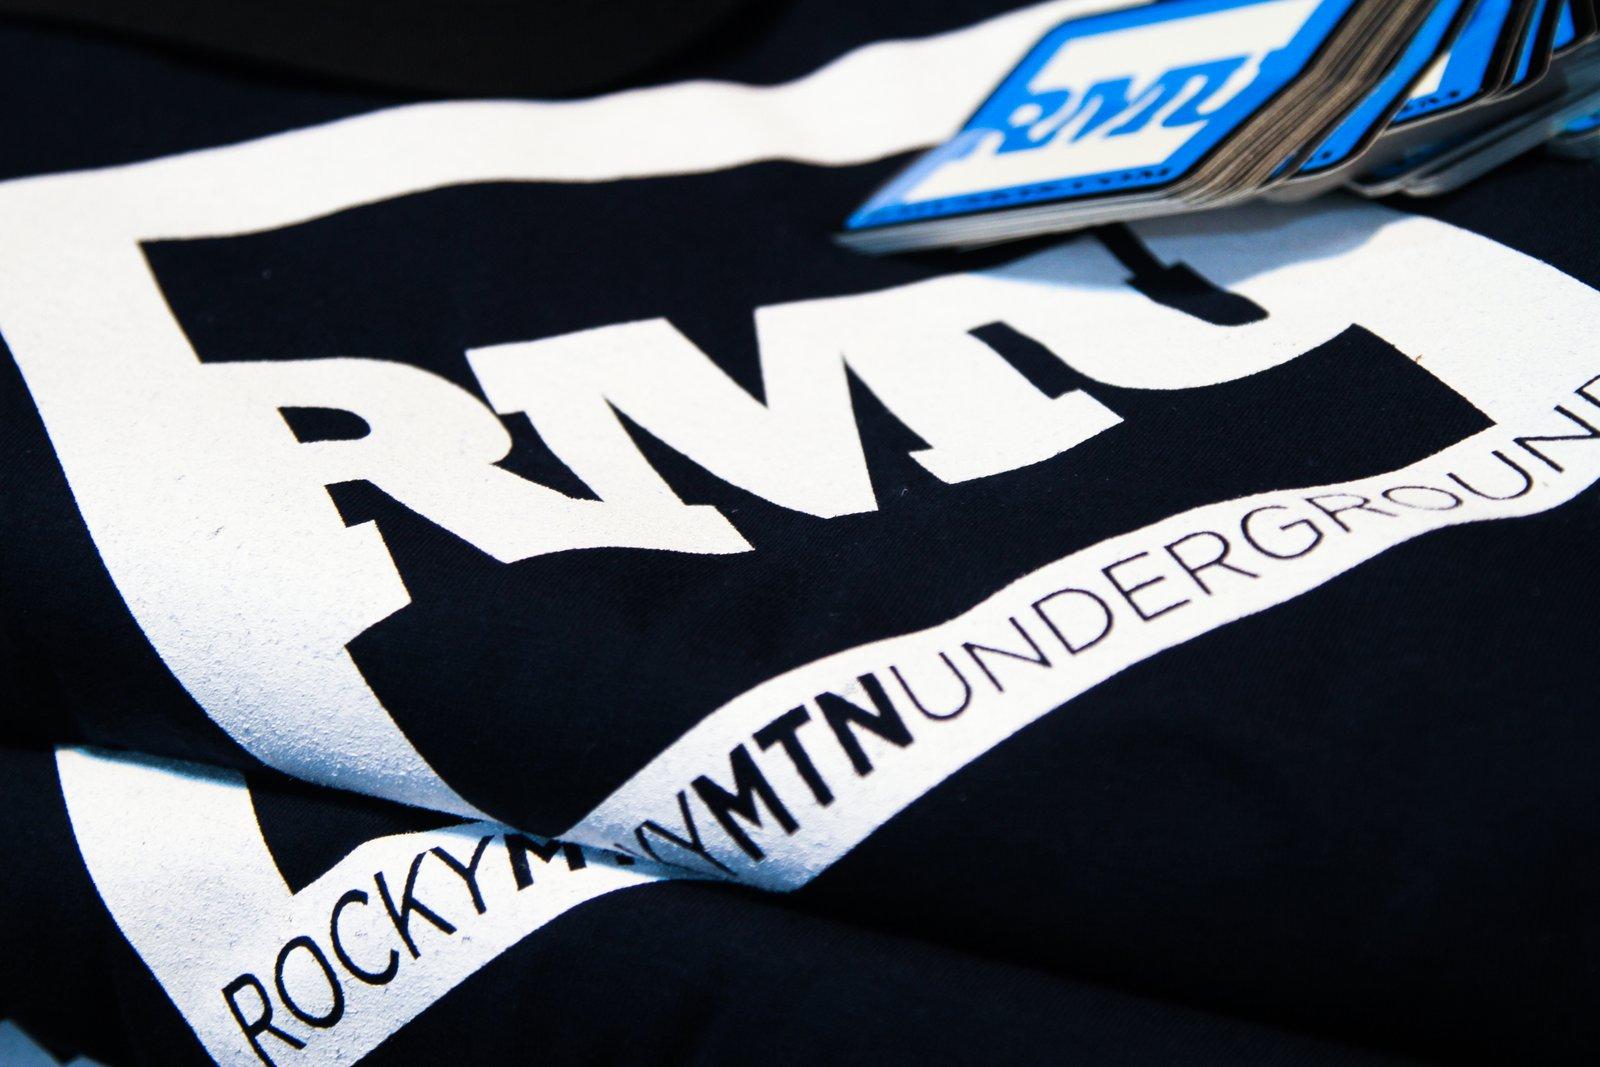 RMU-9.jpg